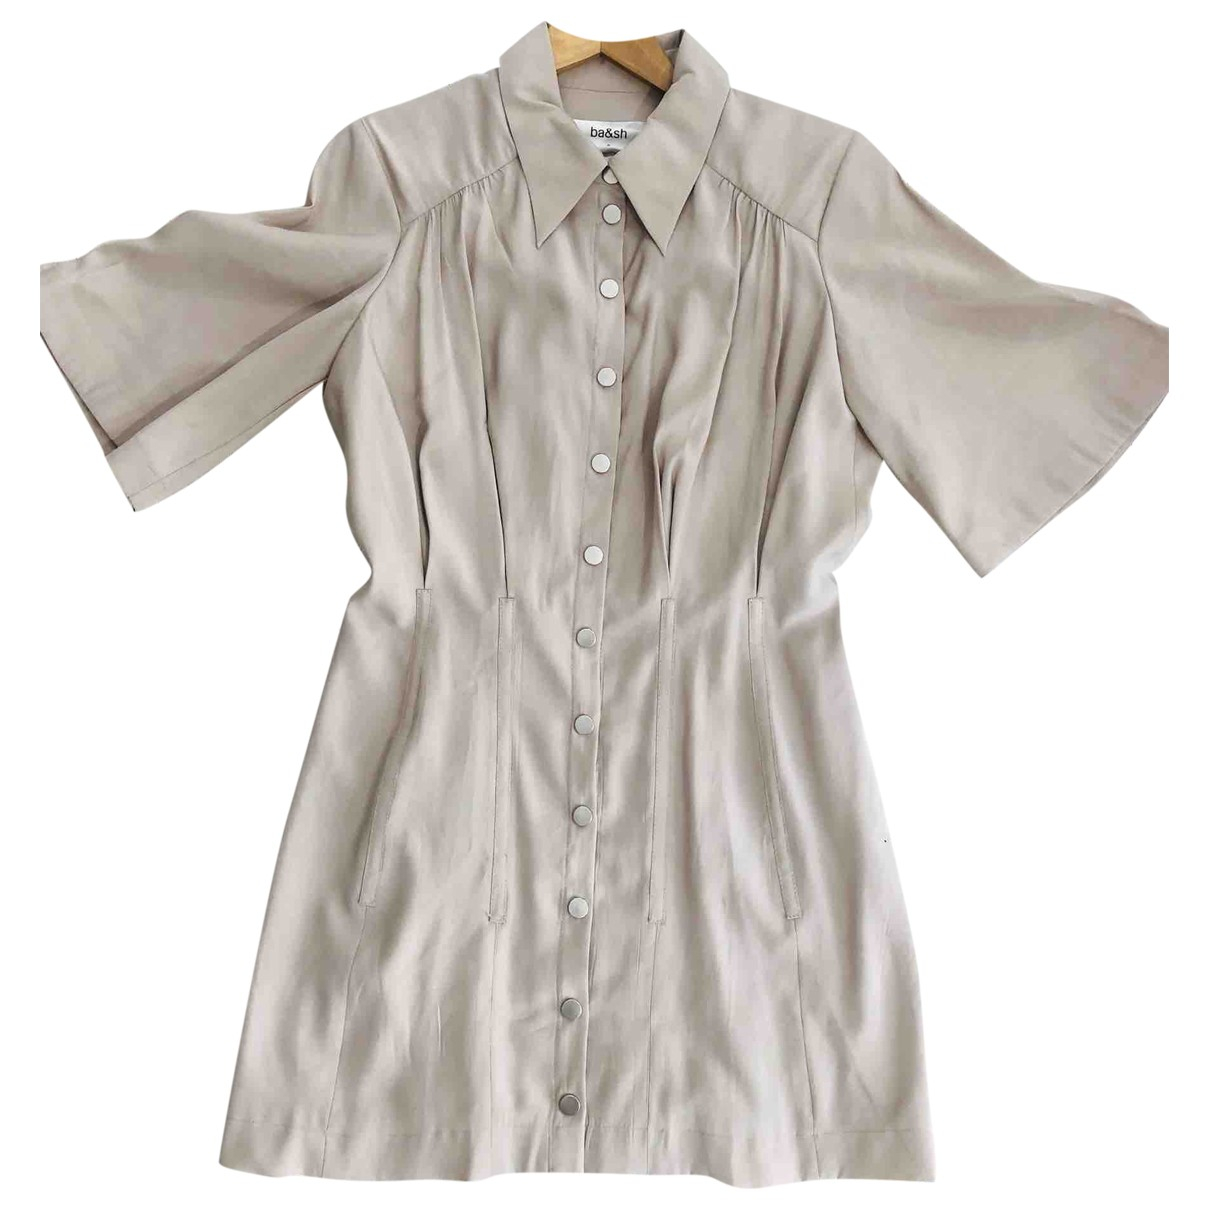 Ba&sh Spring Summer 2020 Beige dress for Women 3 0-5